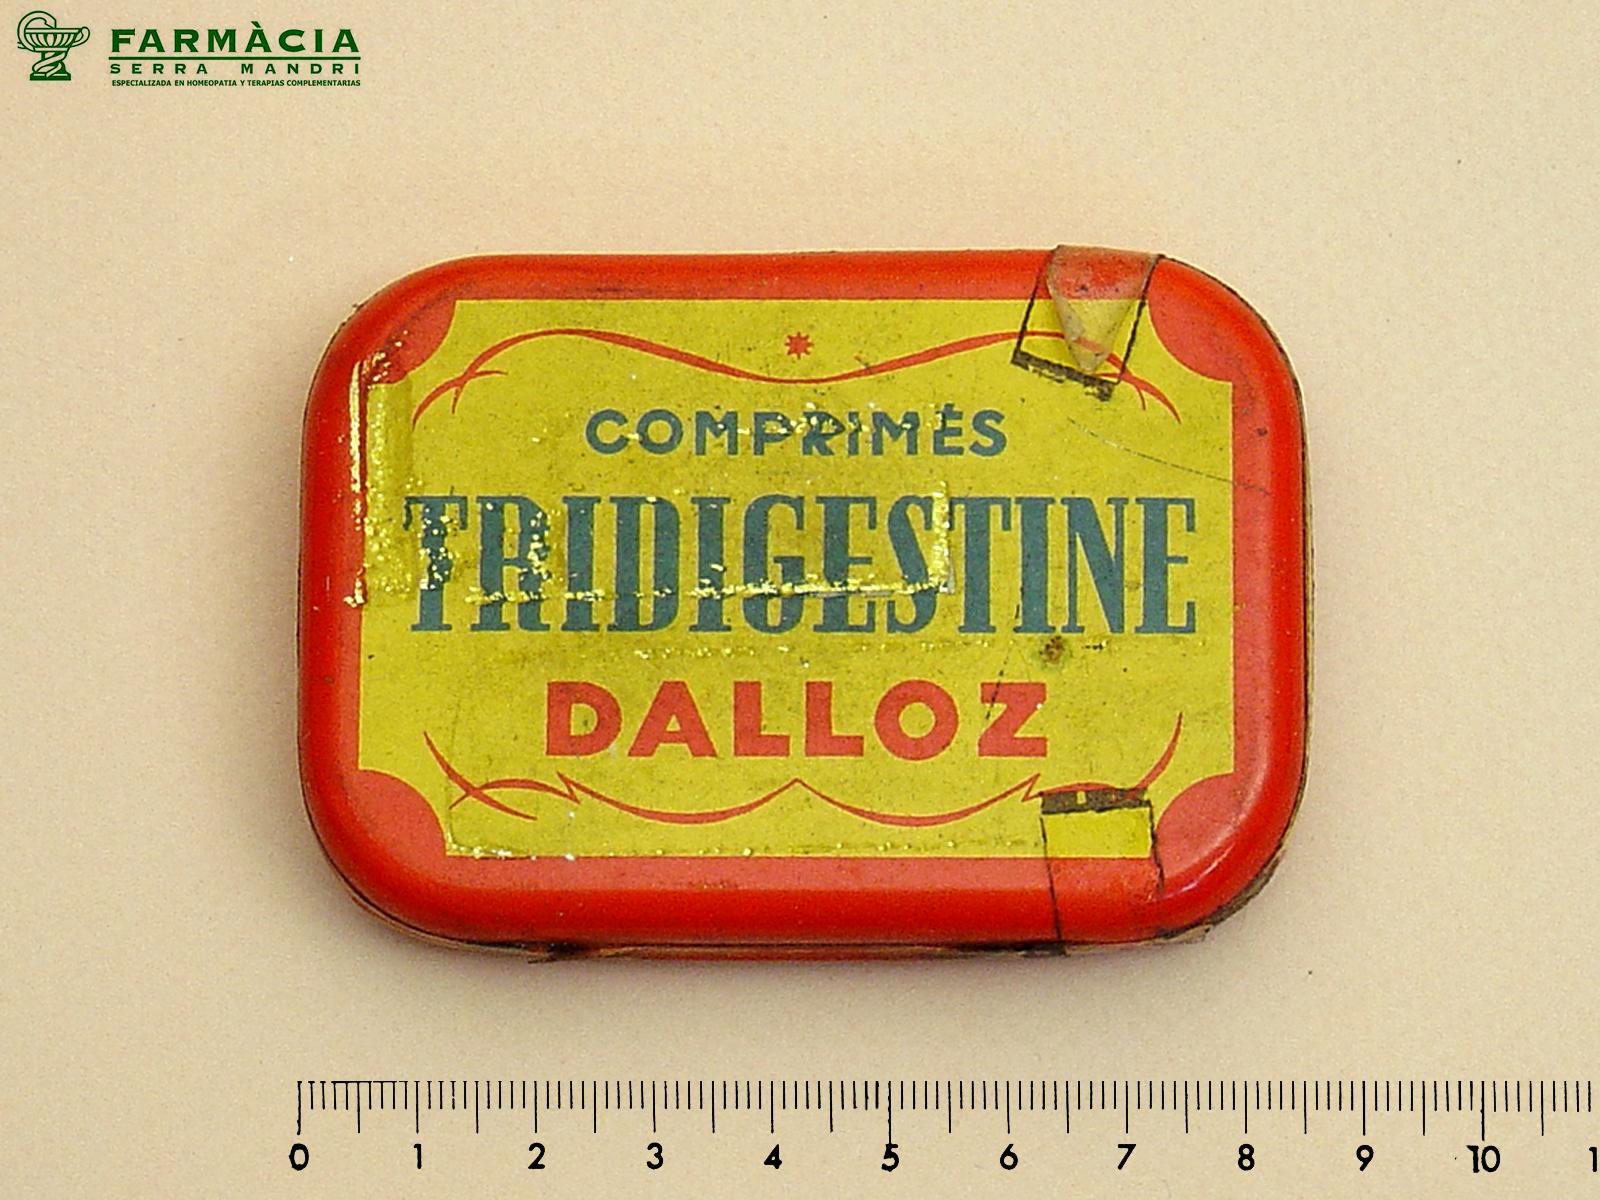 Caja del medicamento Tridigestine